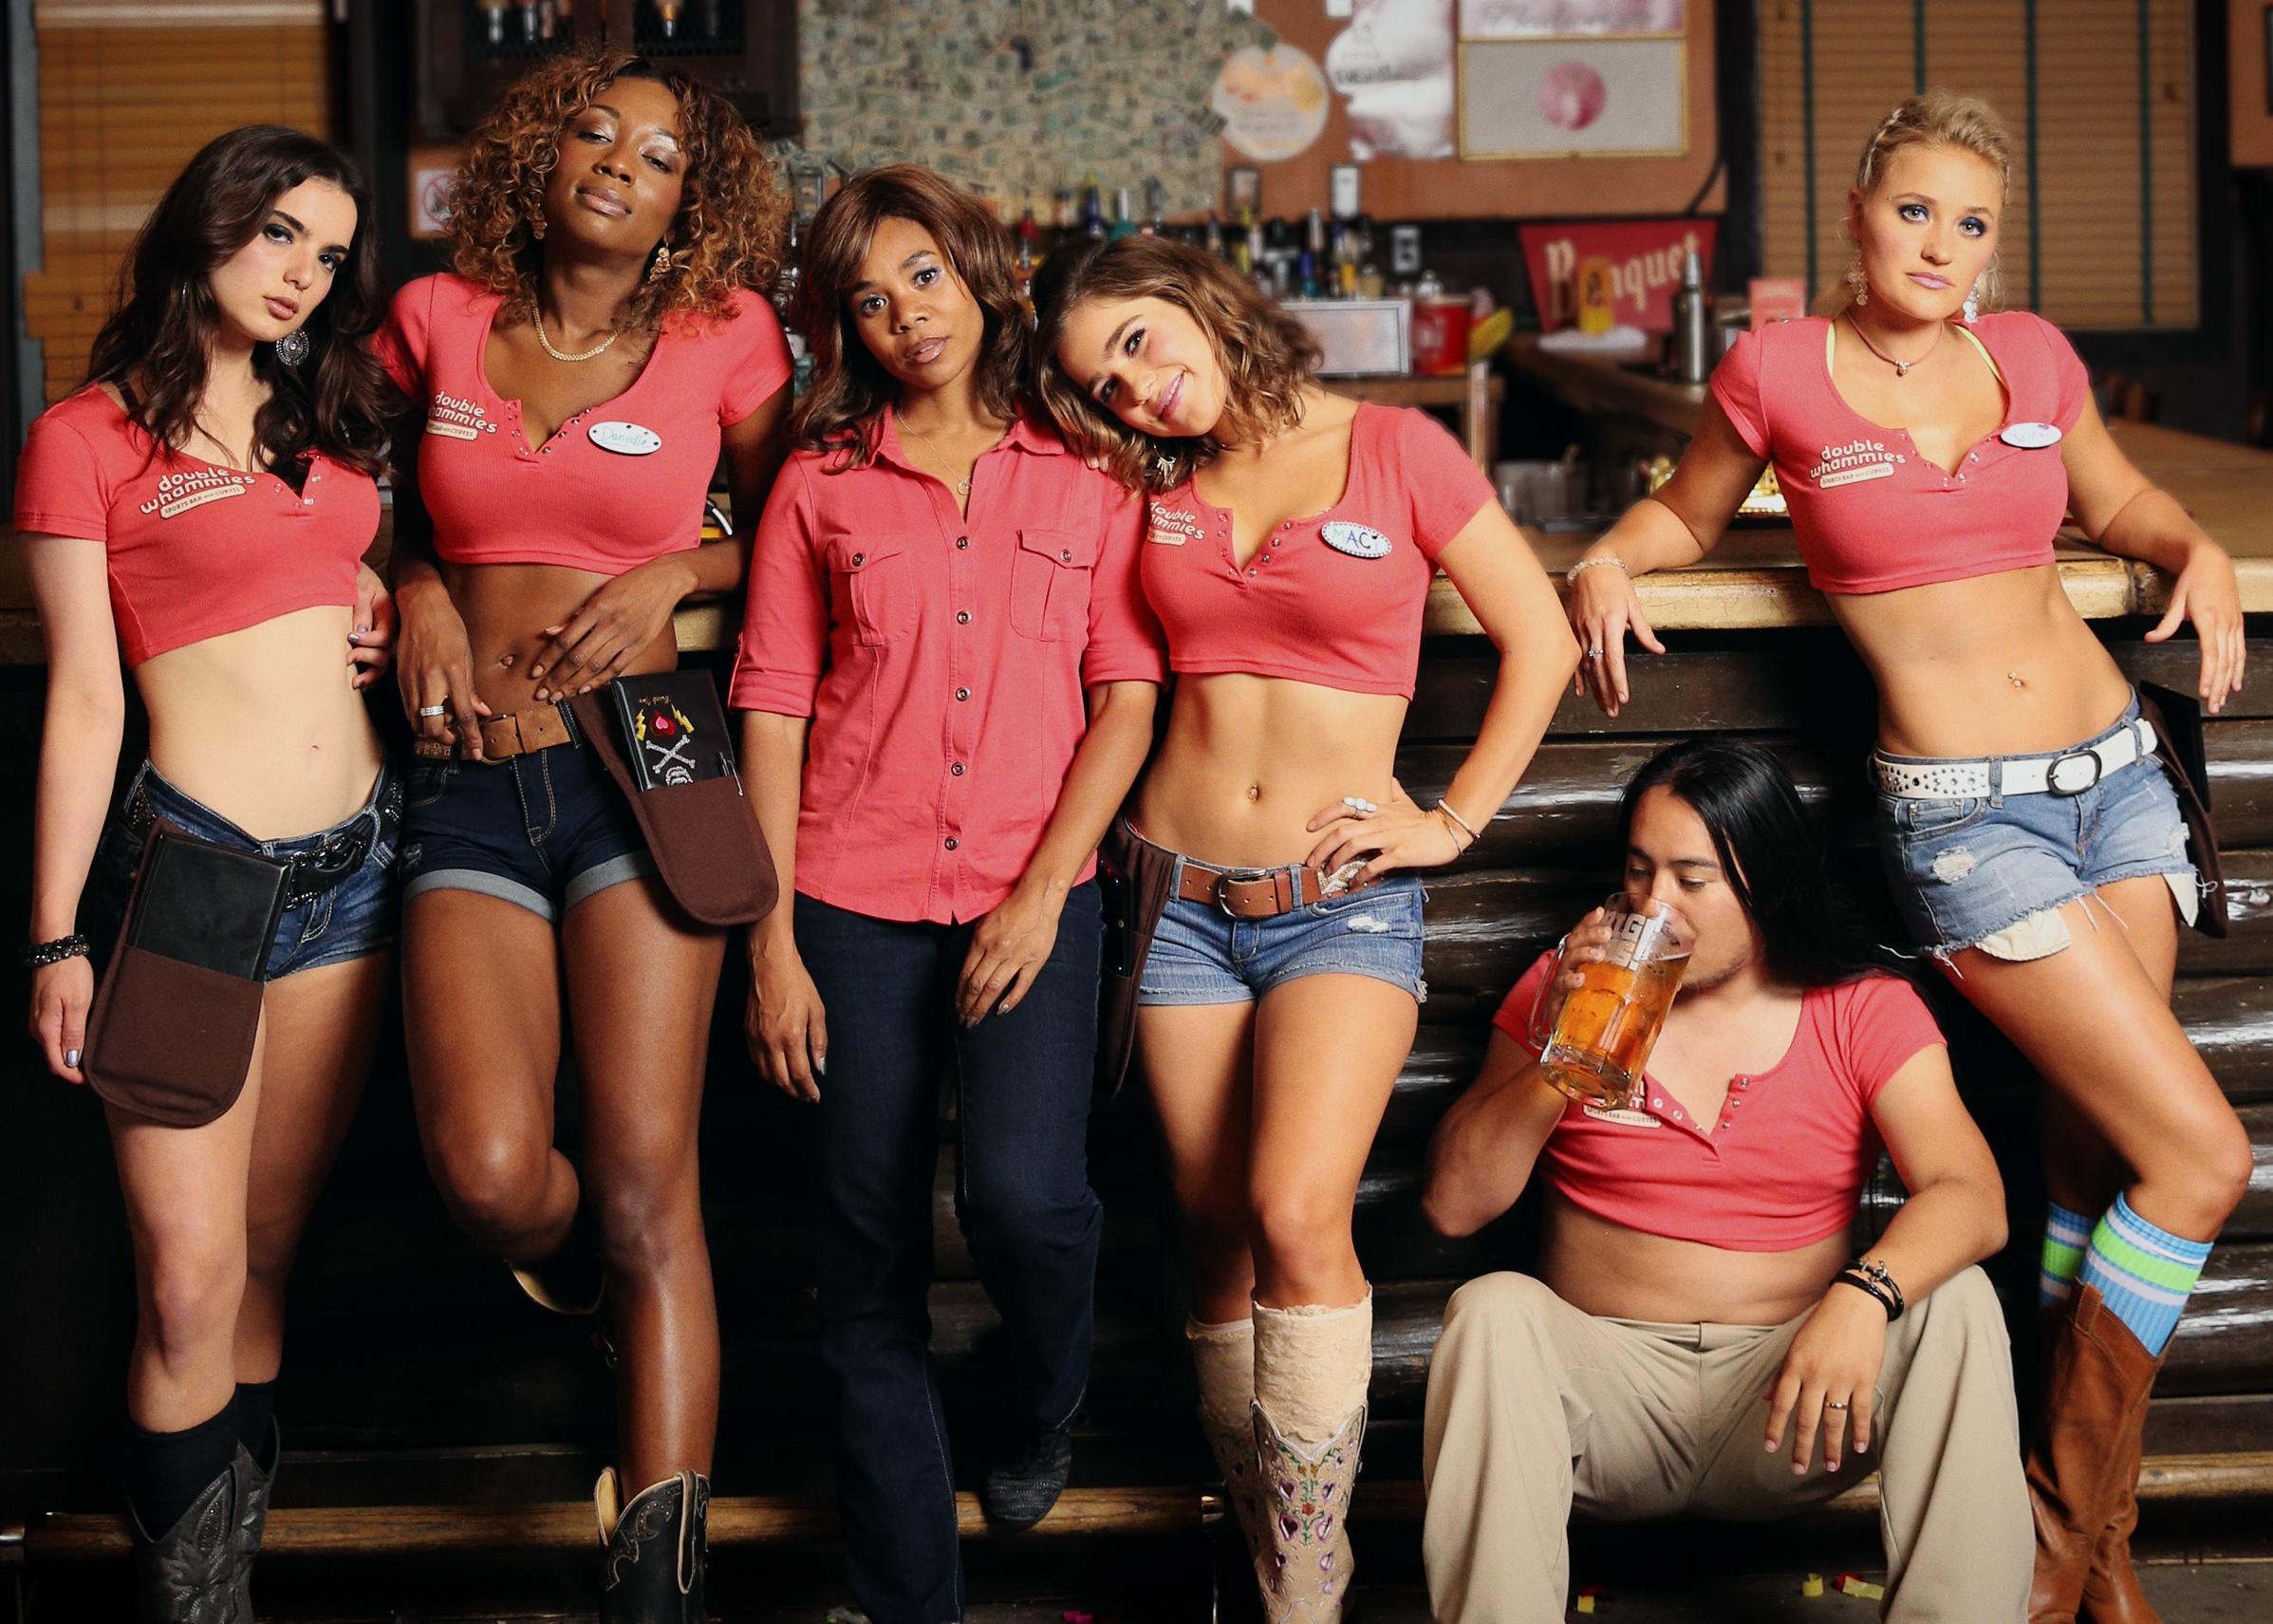 Regina Hall,AJ Michalka,Dylan Gelula,Haley Lu Richardson,Shayna McHayle in Support the Girls